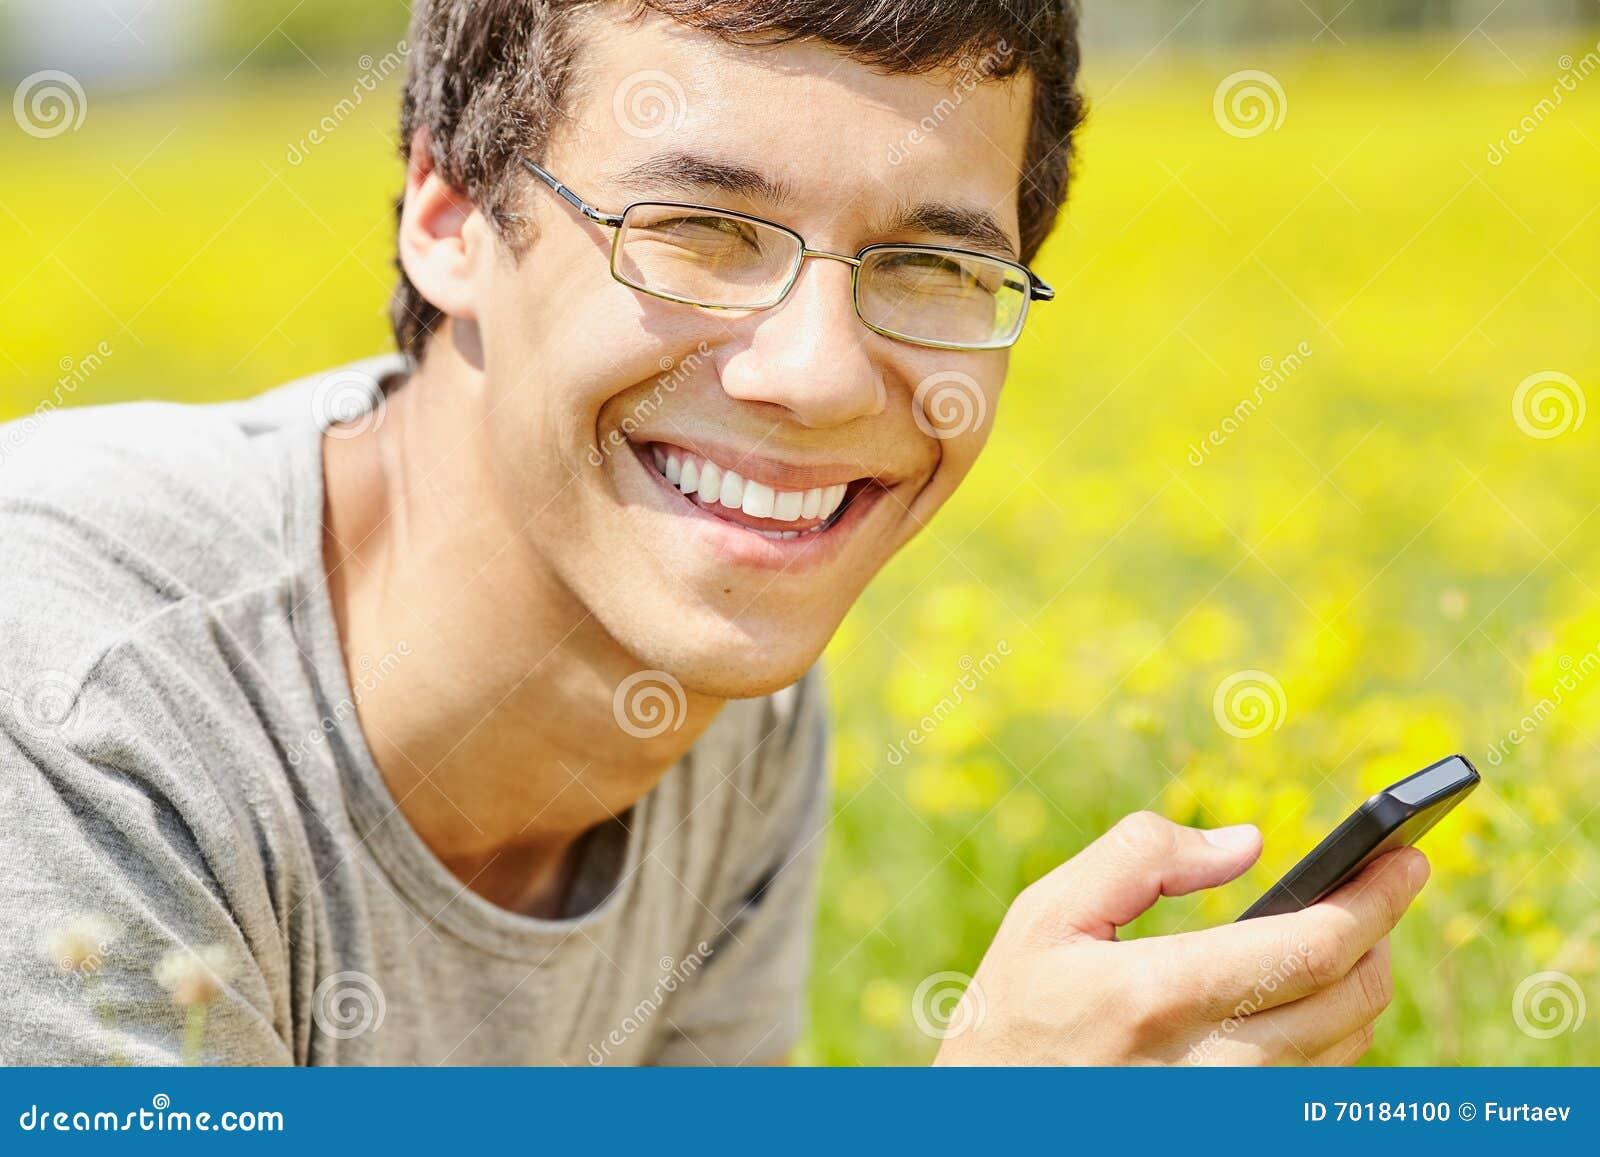 Grabb som smsar på mobiltelefonen